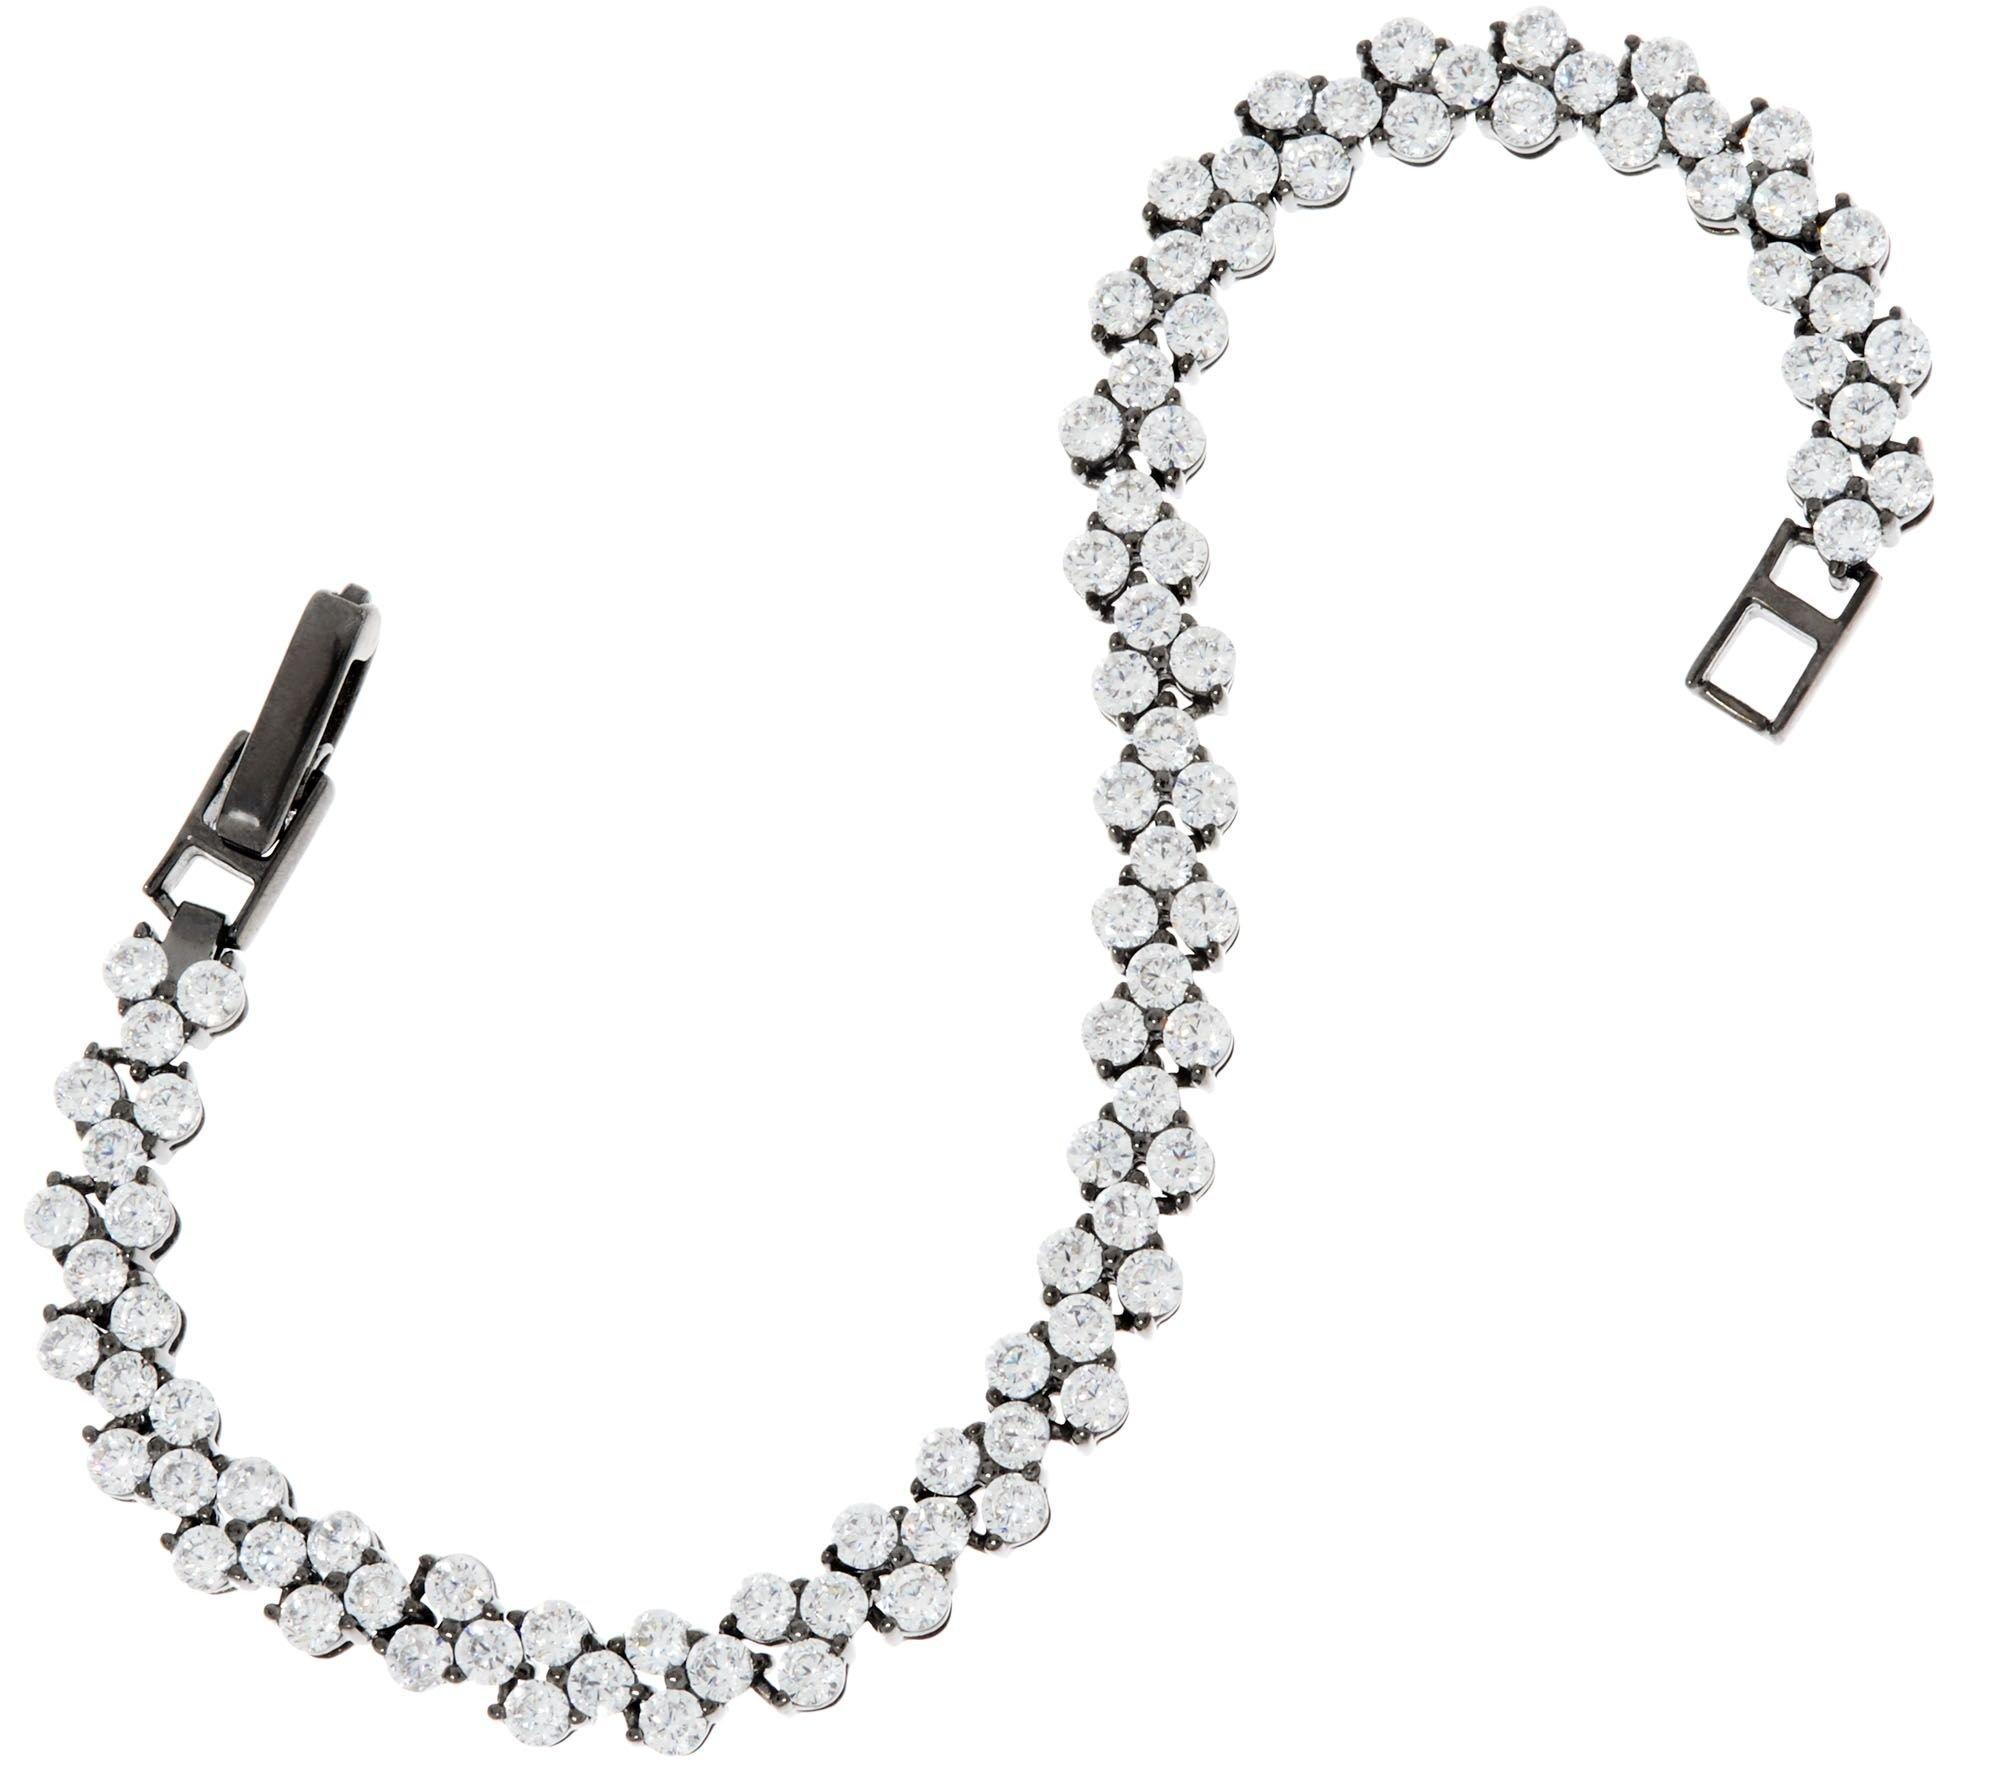 Silvostyles 4.95 cttw Round Cut D/VVS1 Diamond Black Rhodium-Plated Tennis Bracelet